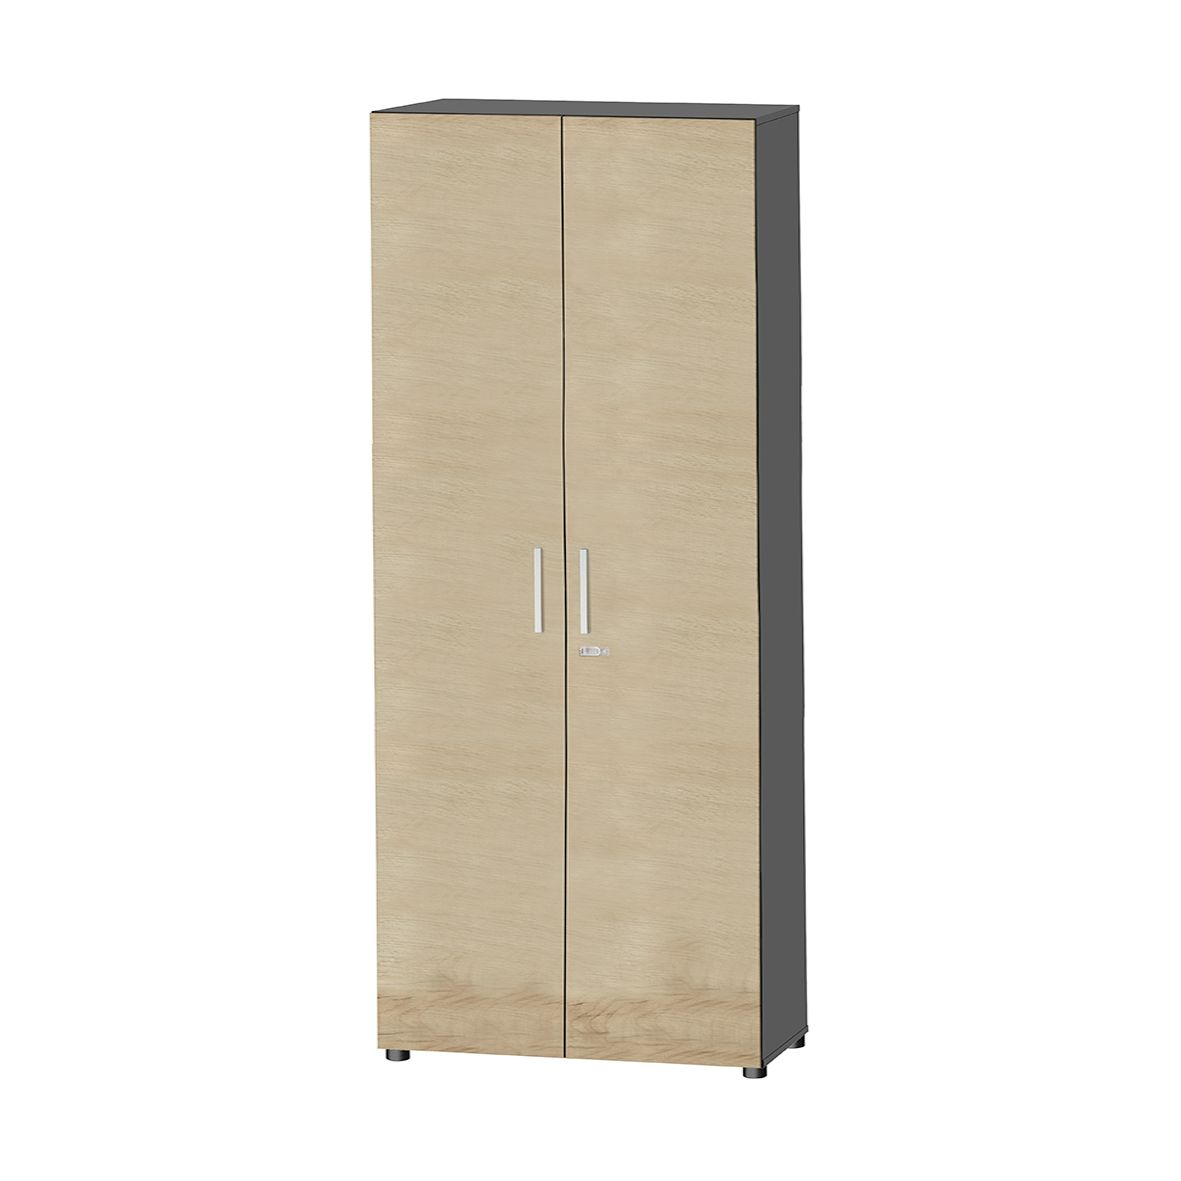 schrank set up abschlie bar 2 4 oder 6 oh b 800 x t 420 x h 744 1470 2196 mm g nstig kaufen. Black Bedroom Furniture Sets. Home Design Ideas